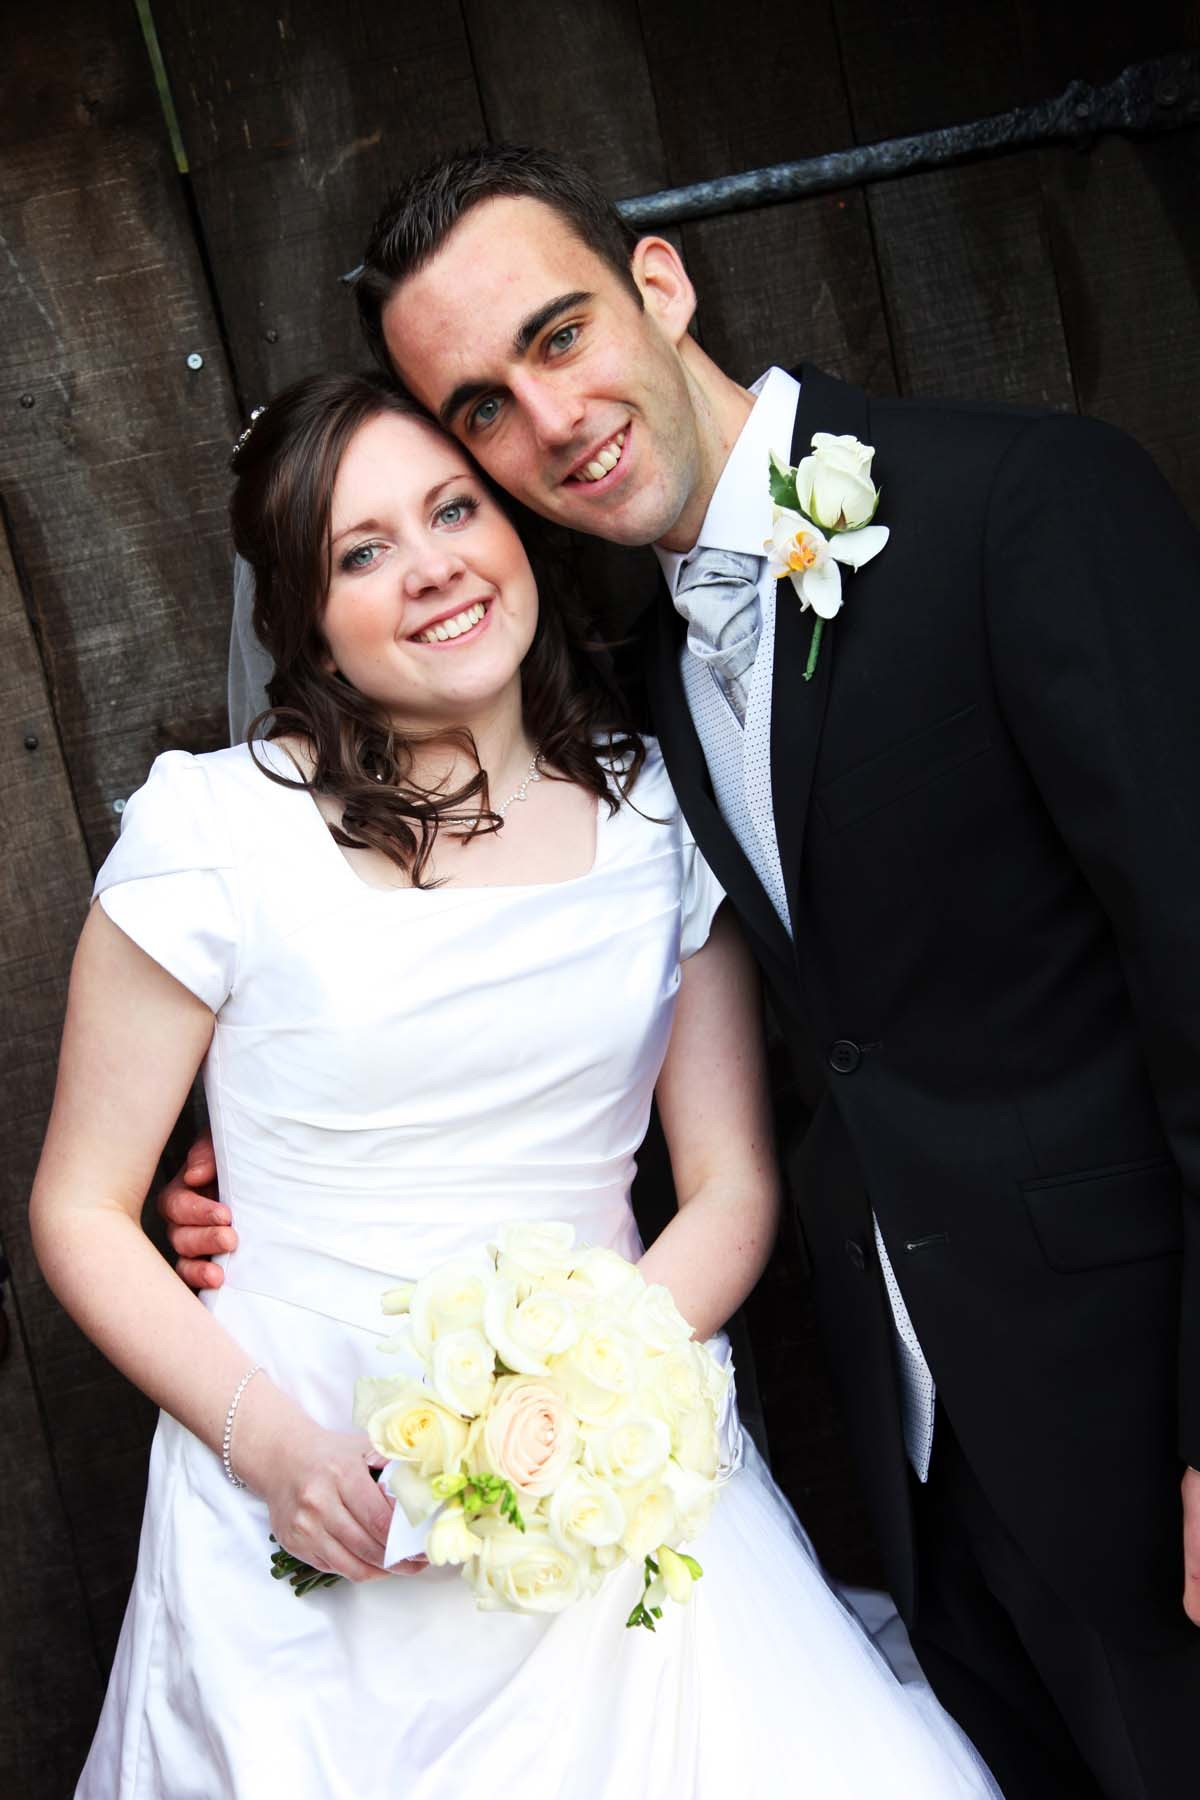 Sussex & Surrey Wedding Photographer - Bride & Groom (20)